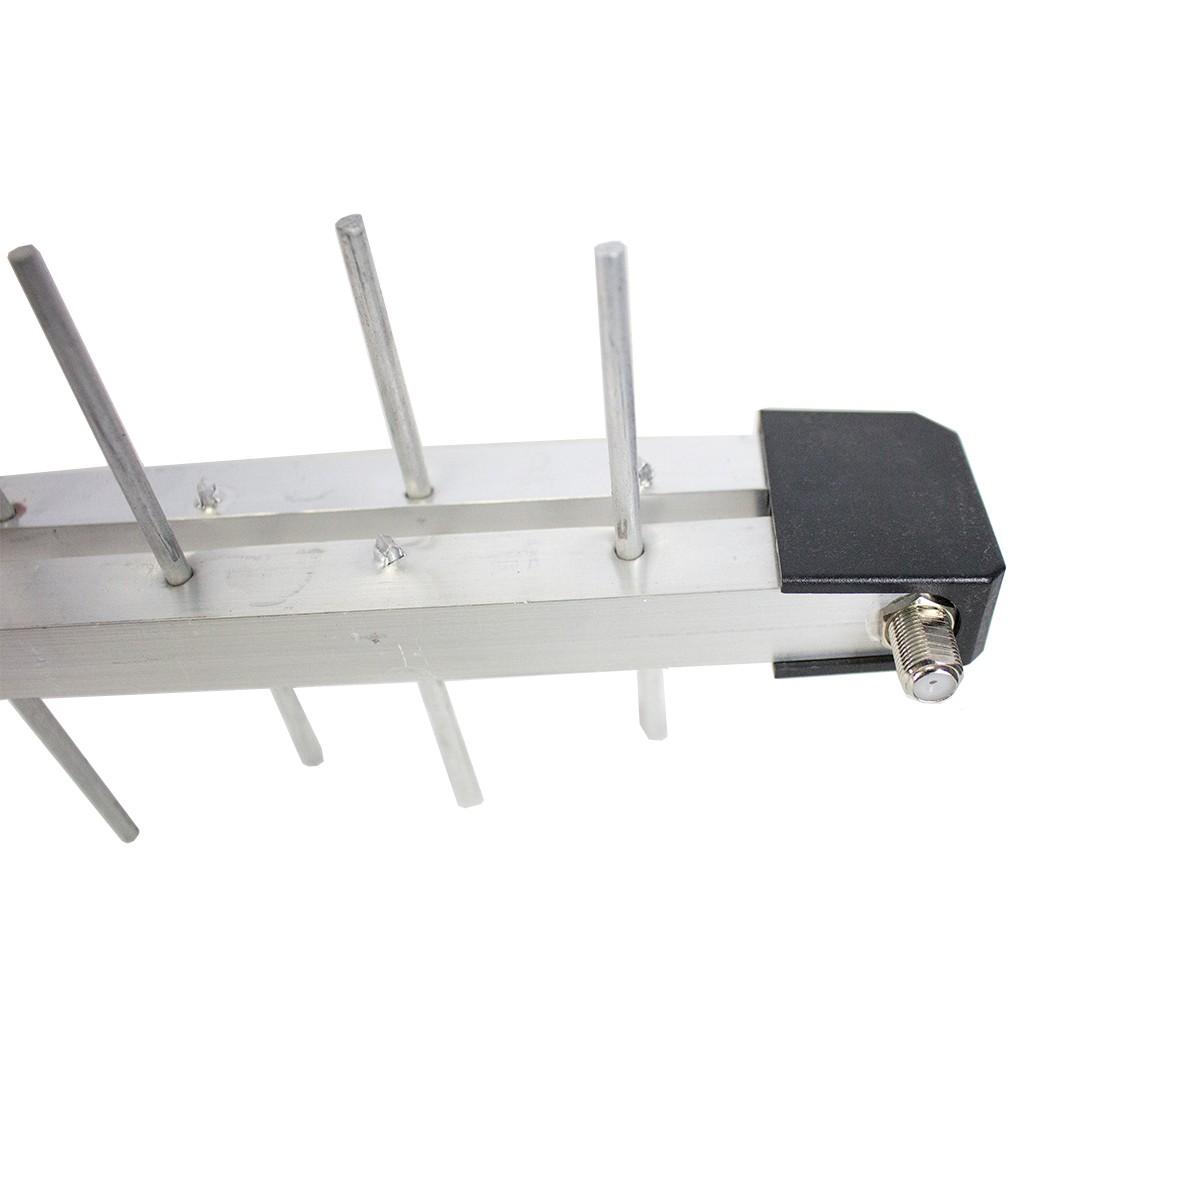 Antena UHF Digital – 38 elementos